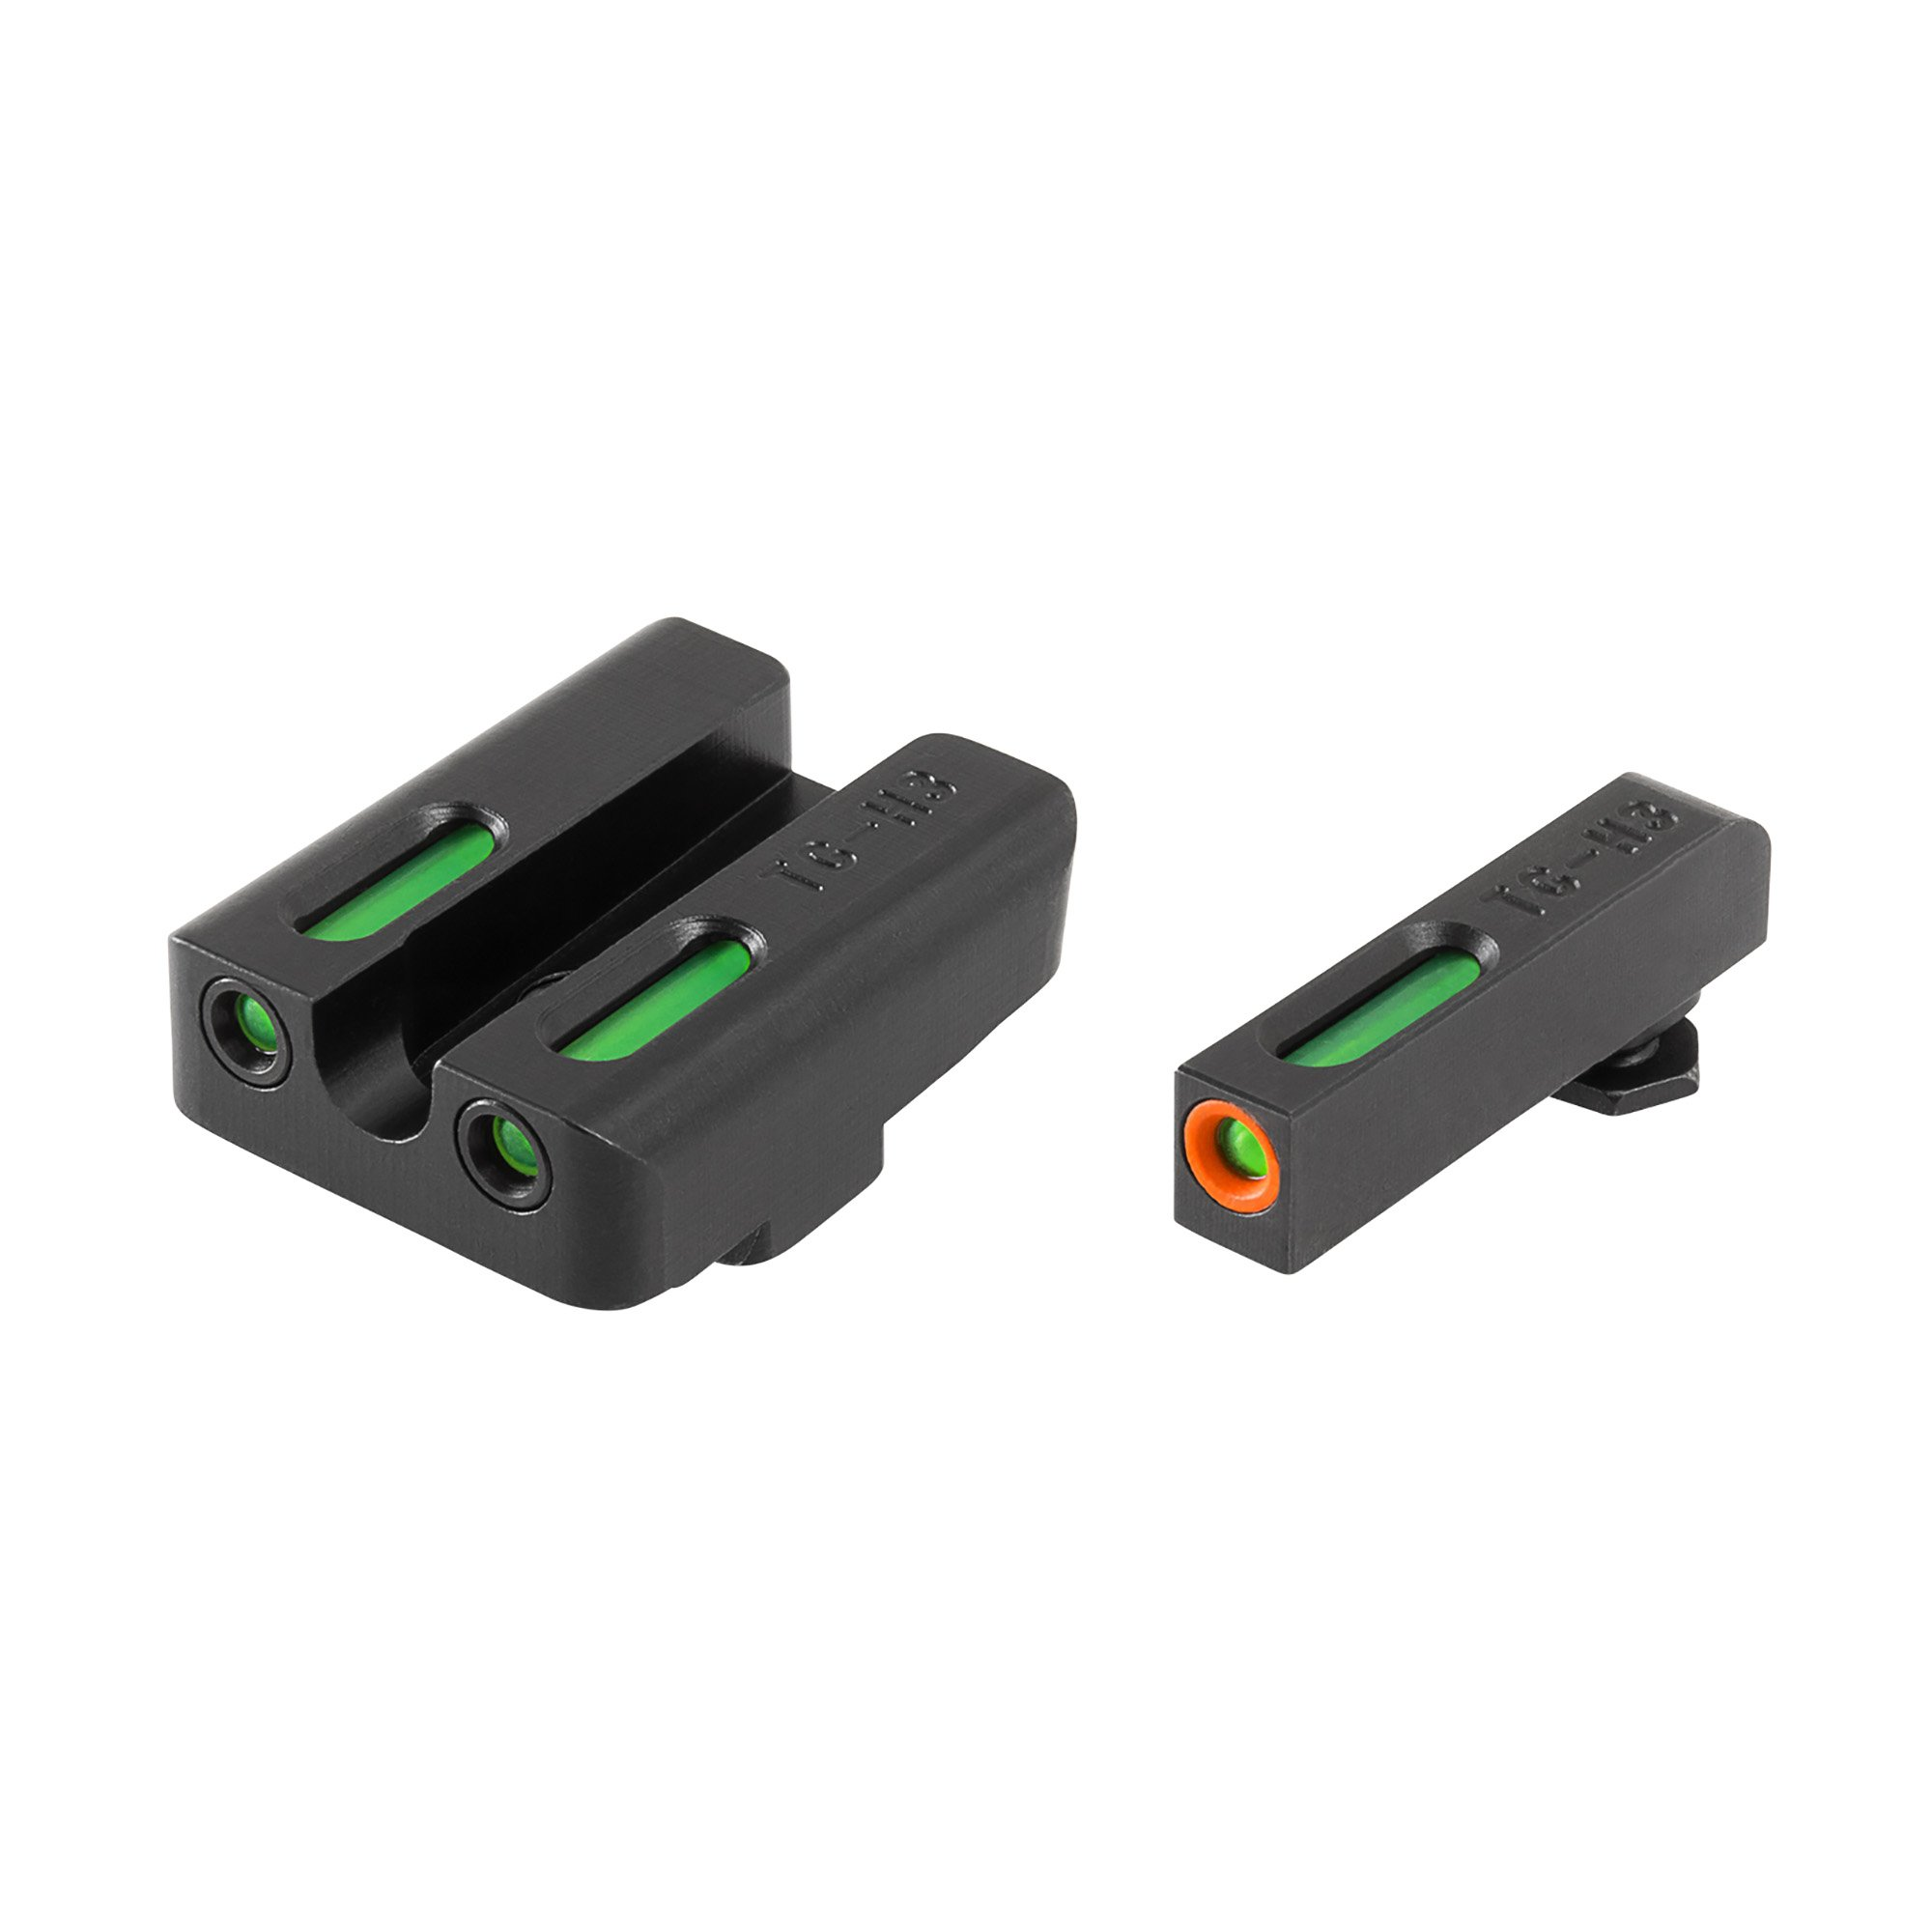 TRUGLO 1007606 TFX Glock High Set PRO Orn Handgun Sight by TRUGLO (Image #1)